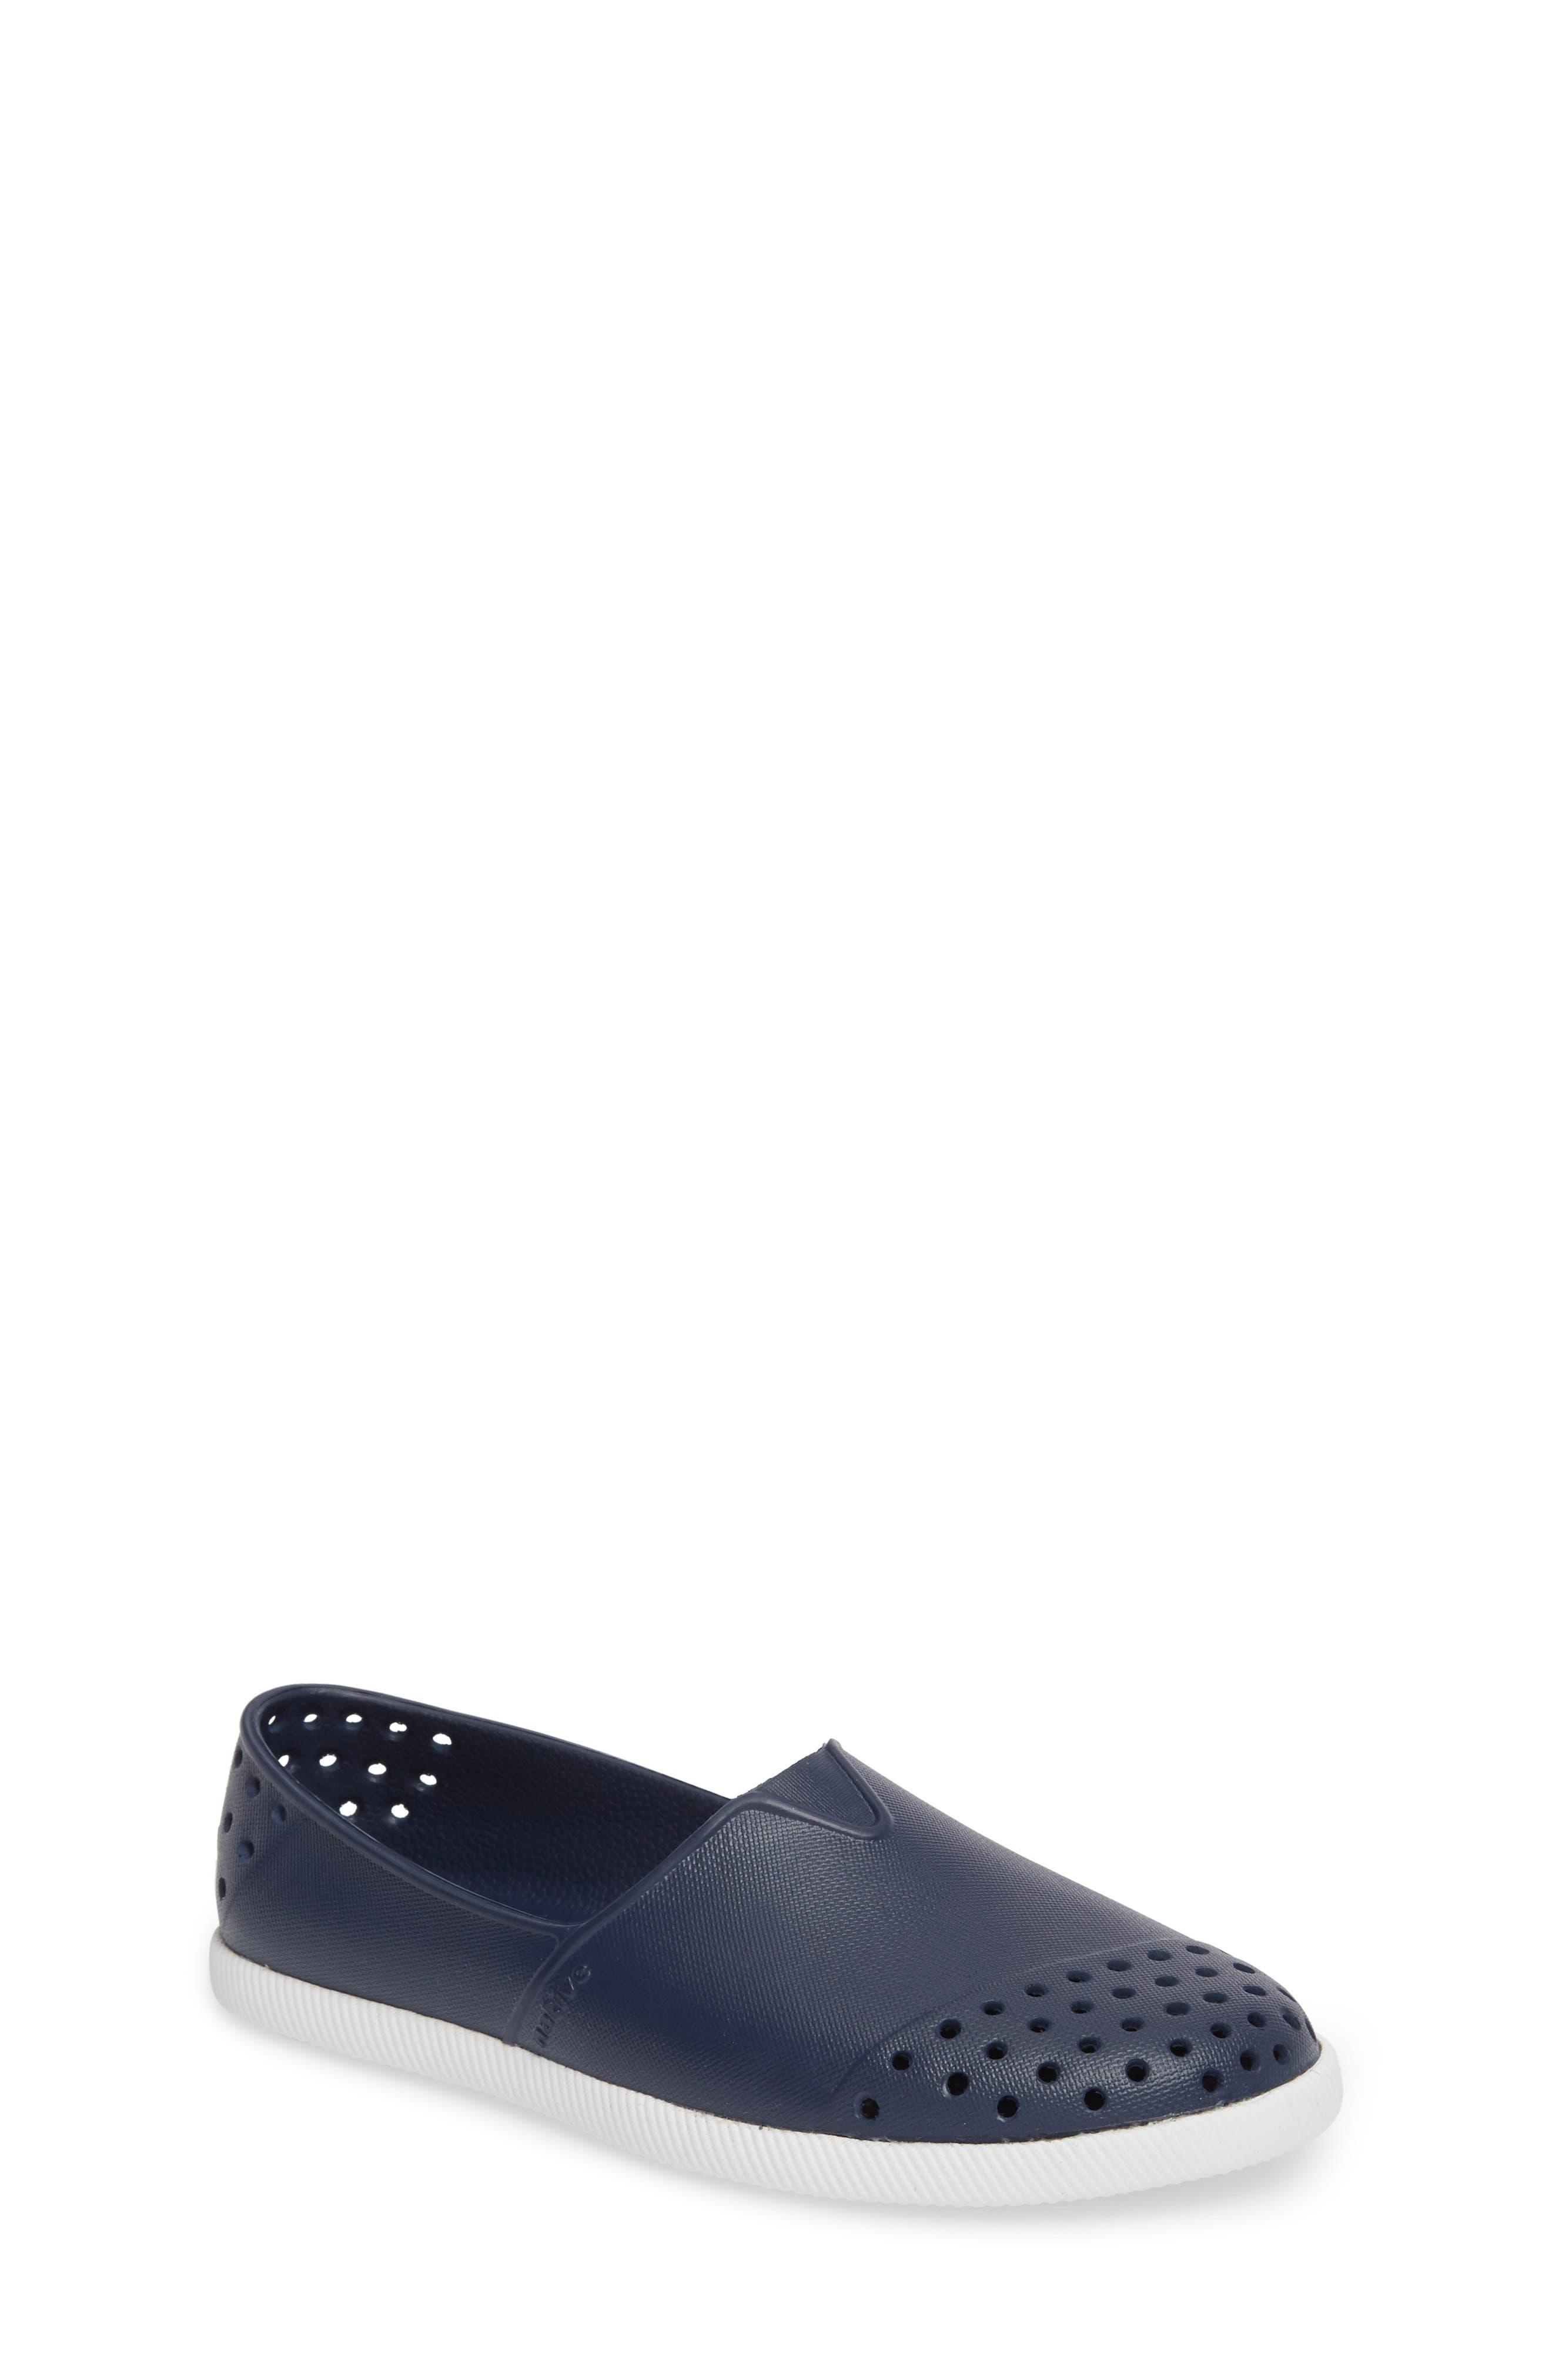 Native Shoes Verona Junior Perforated Slip-On (Little Kid)